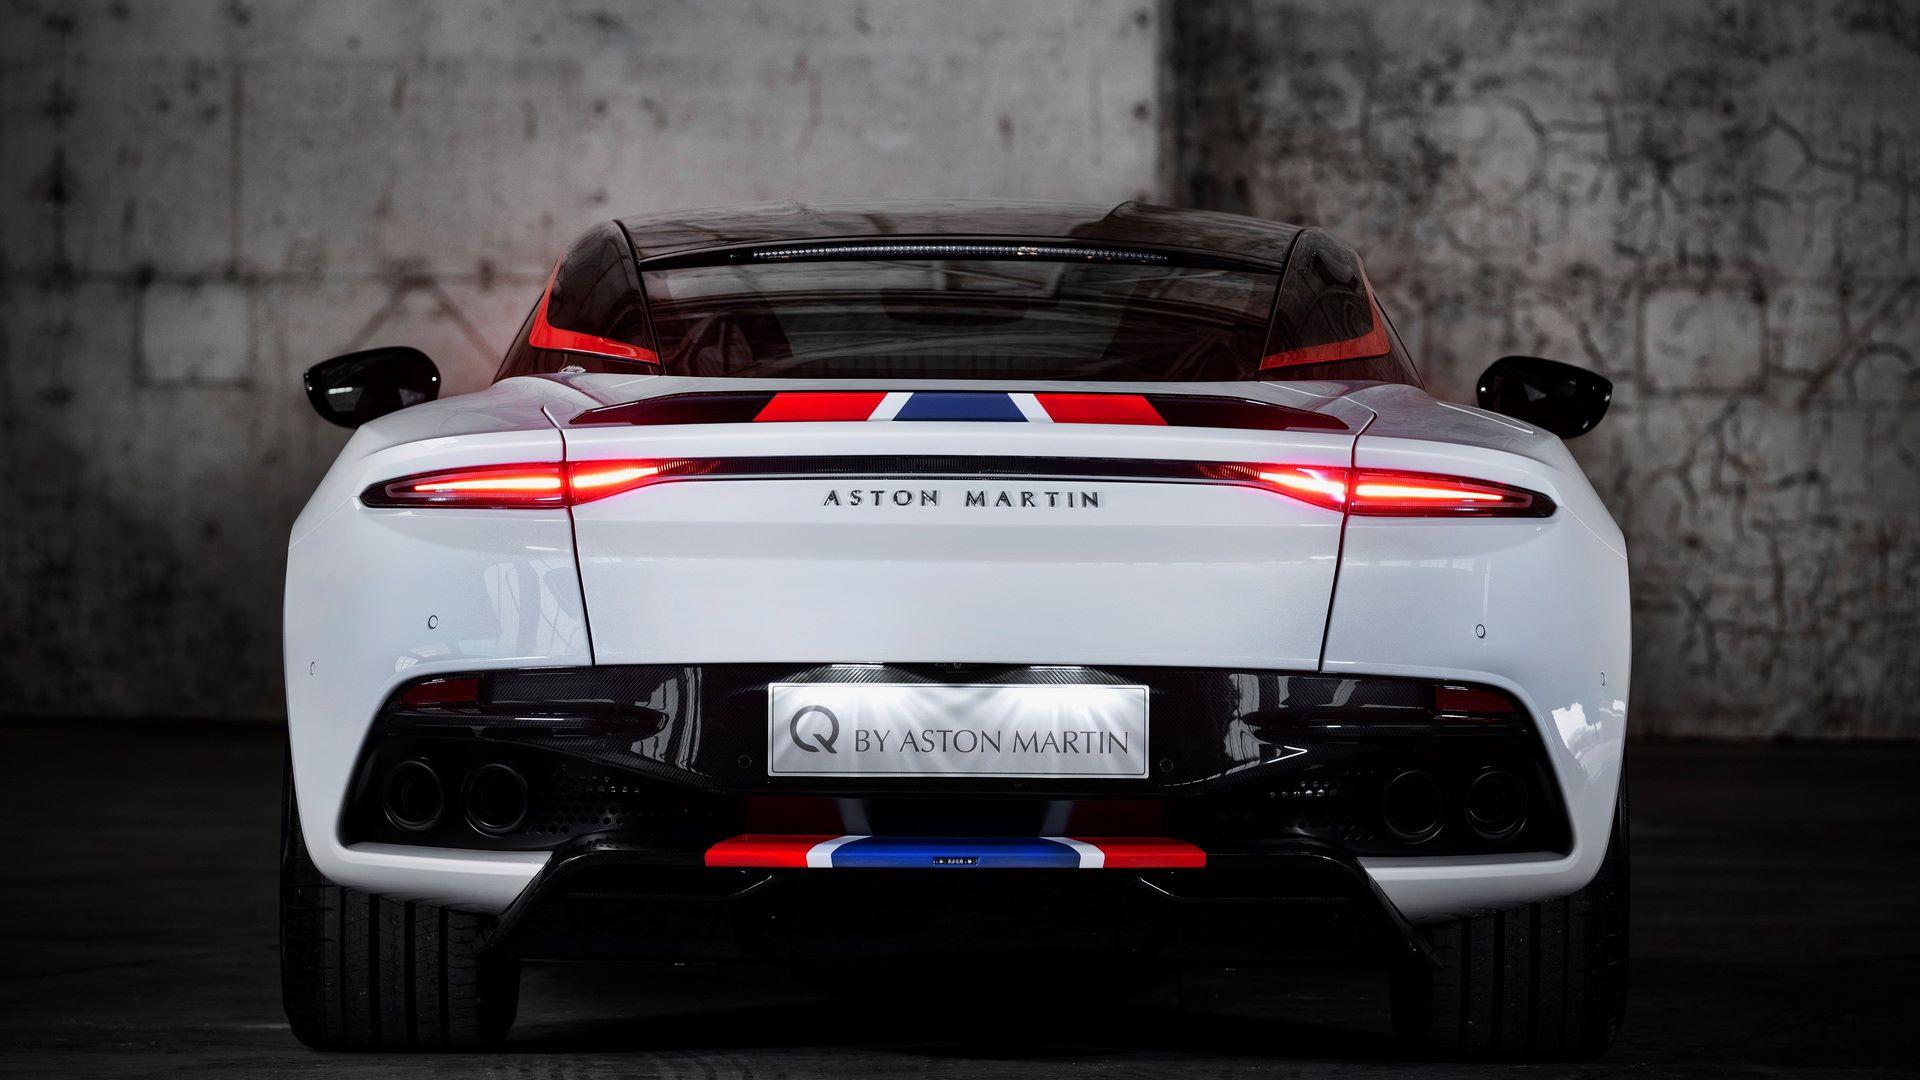 2021-aston-martin-dbs-superleggera-concorde-edition-2